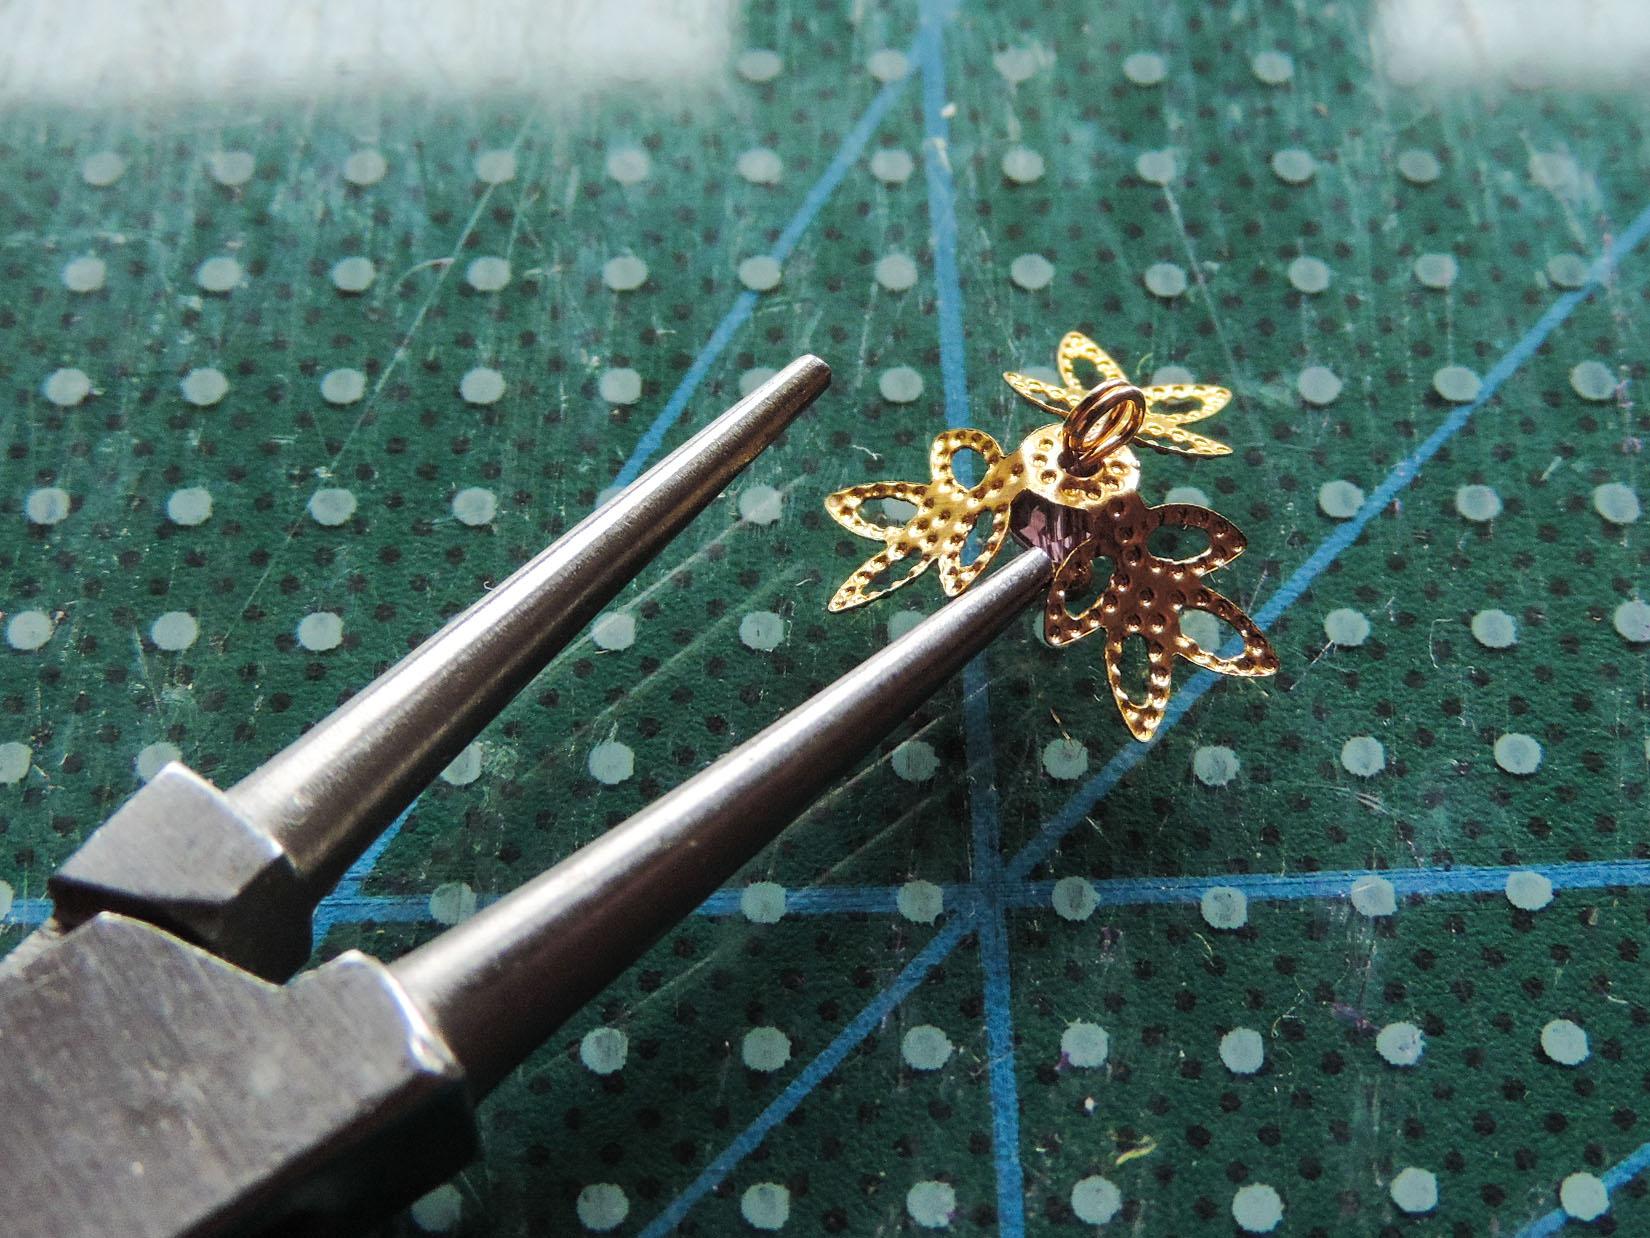 Iris flower tutorial - preparing the center piece 2